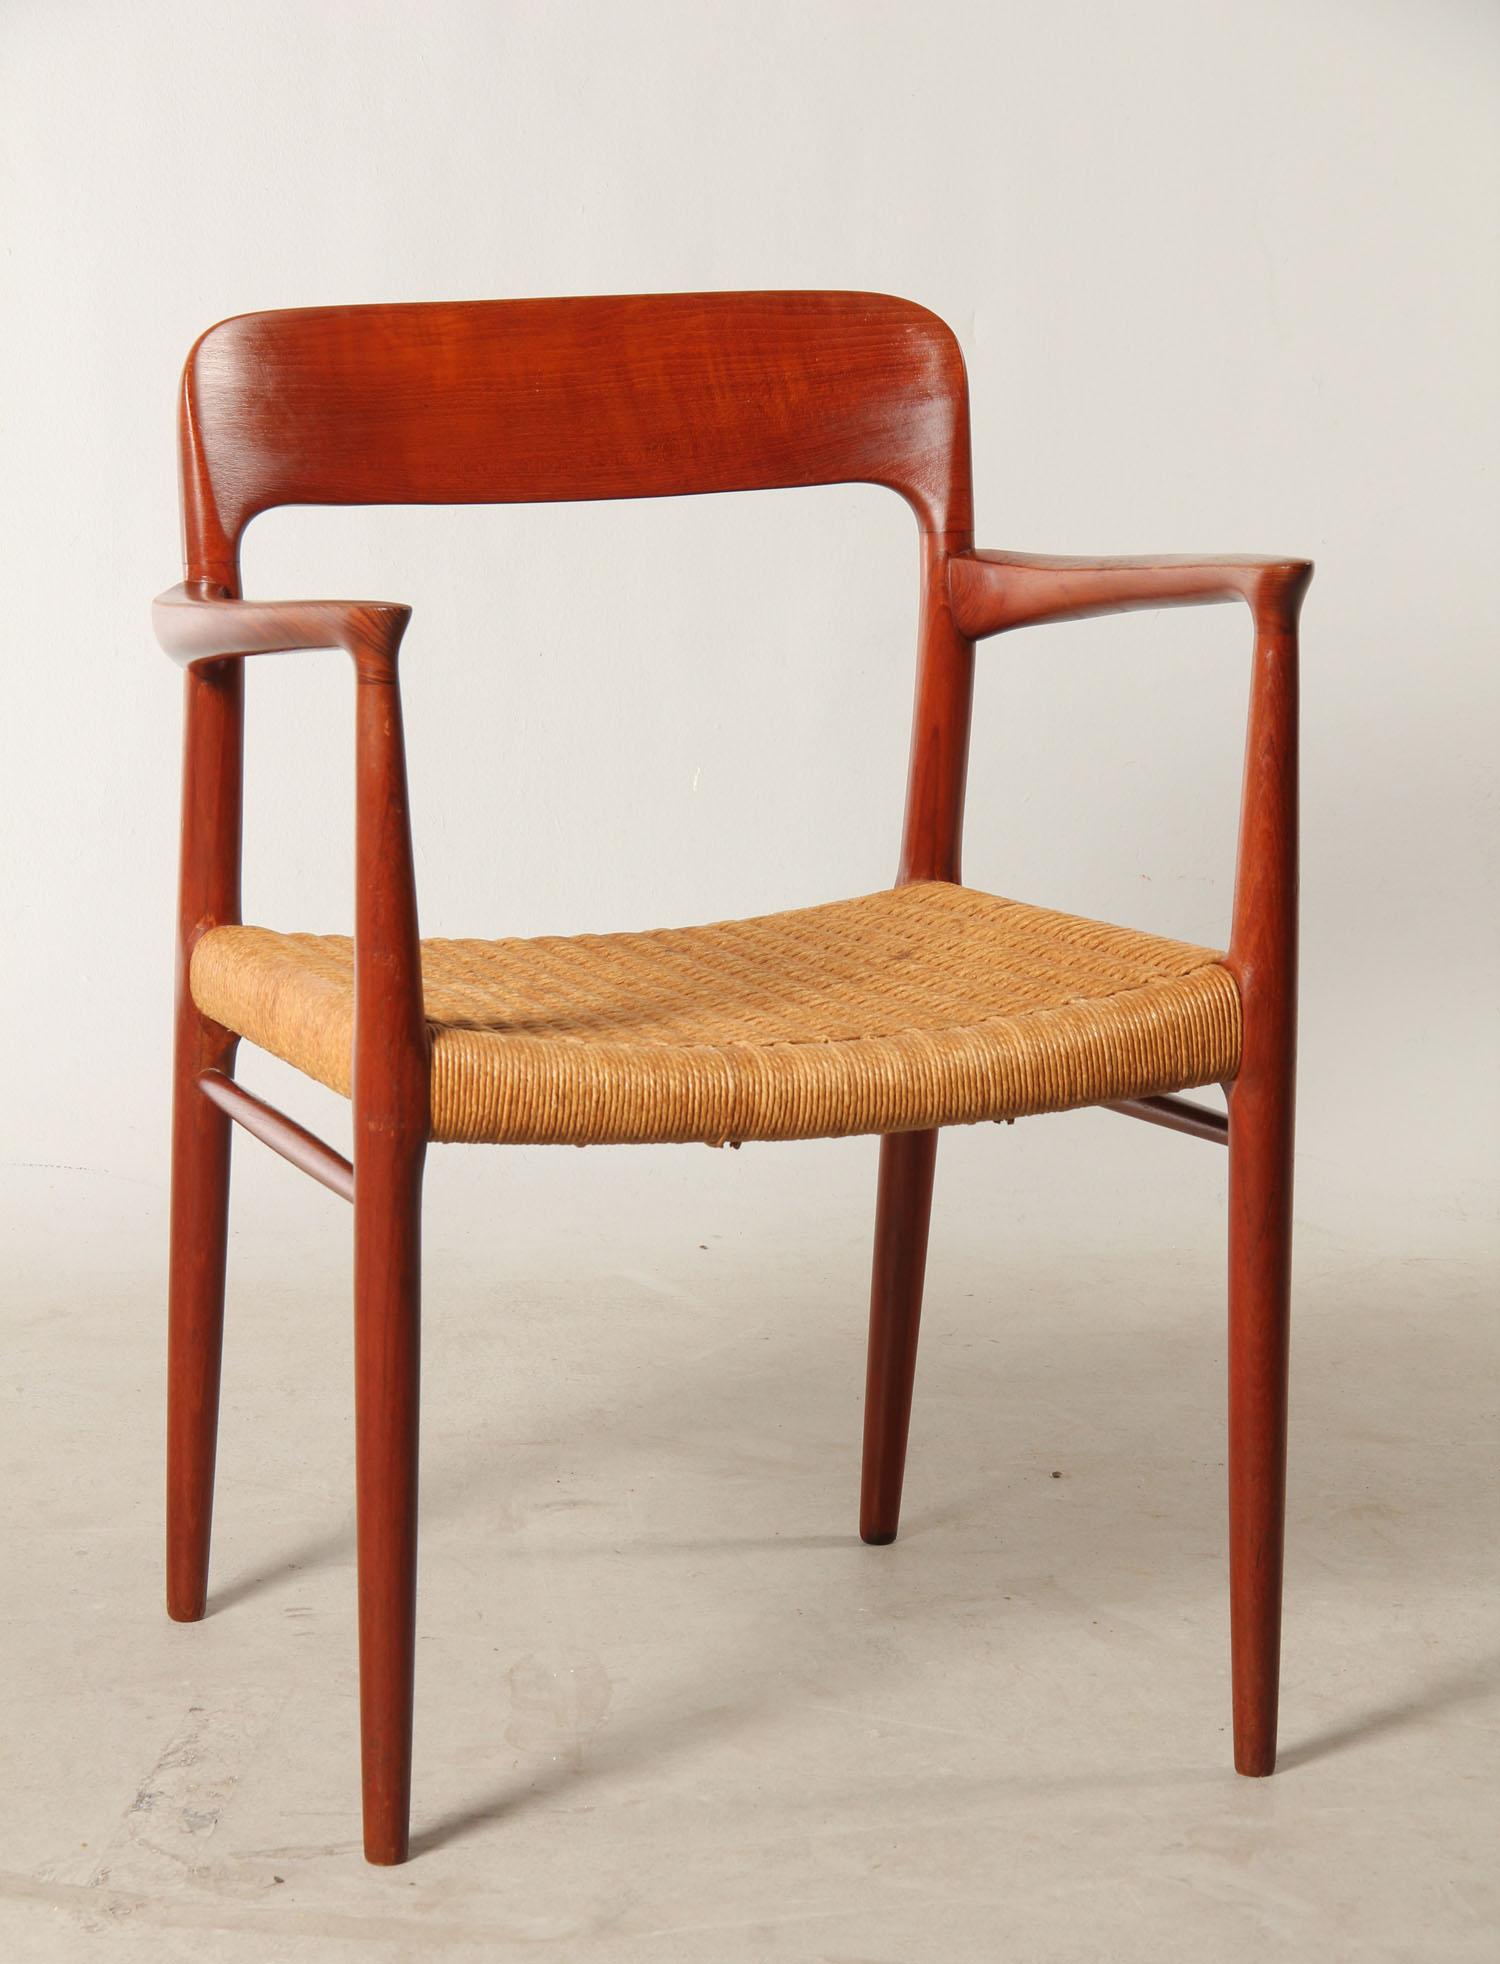 Auktionstipset - N. O. Møller, armstol i teak, model 56